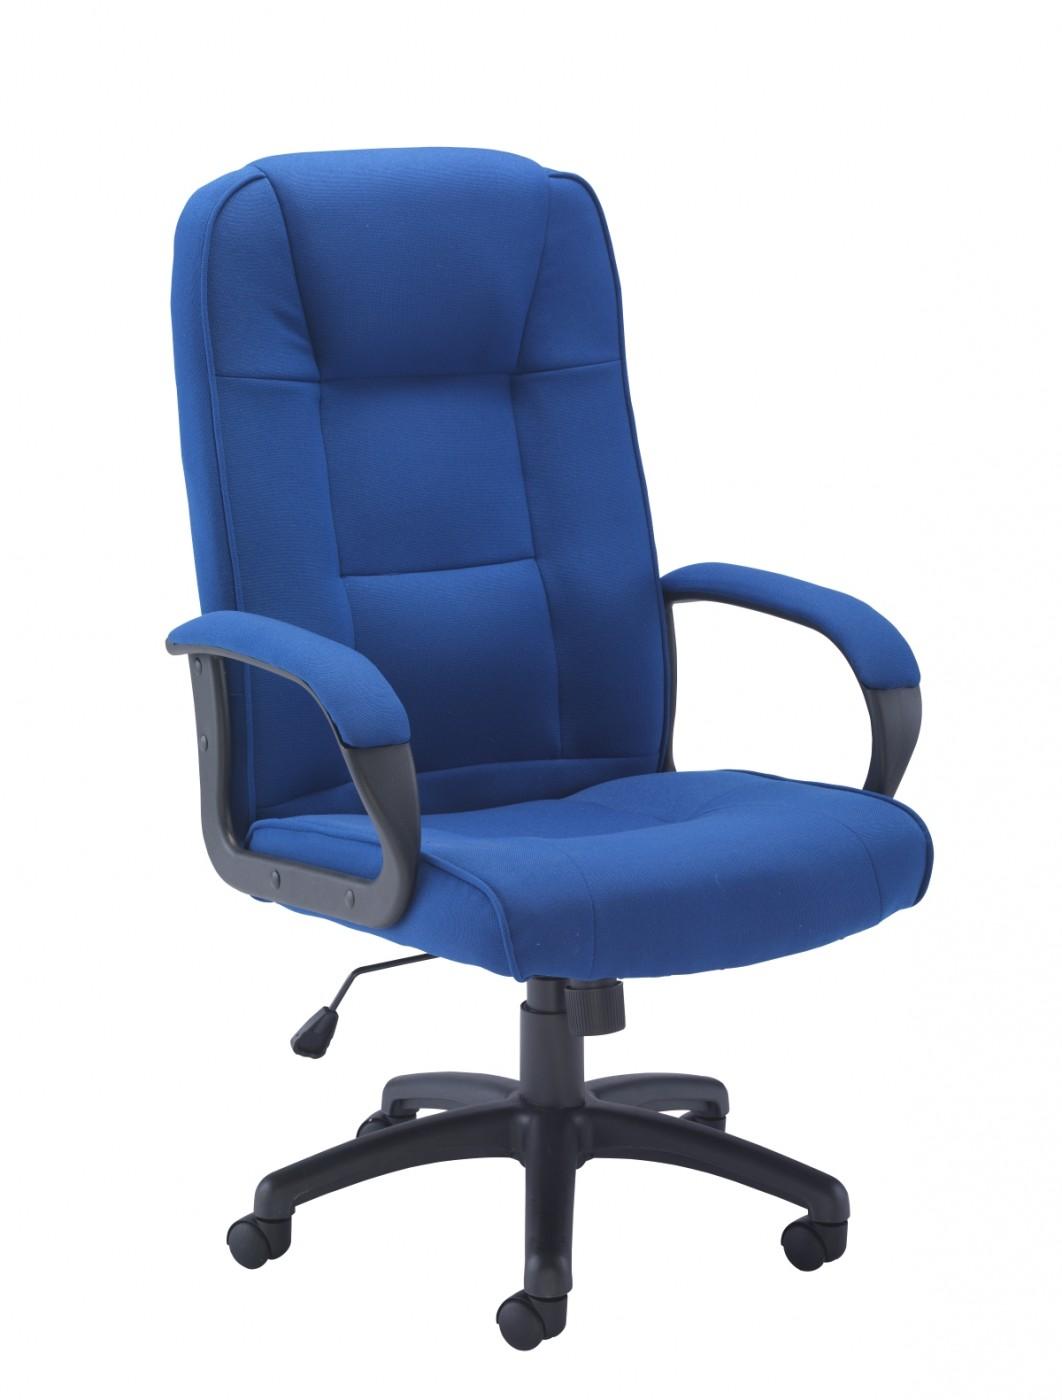 fabric office chairs uk dildo chair tc keno ch0137 121